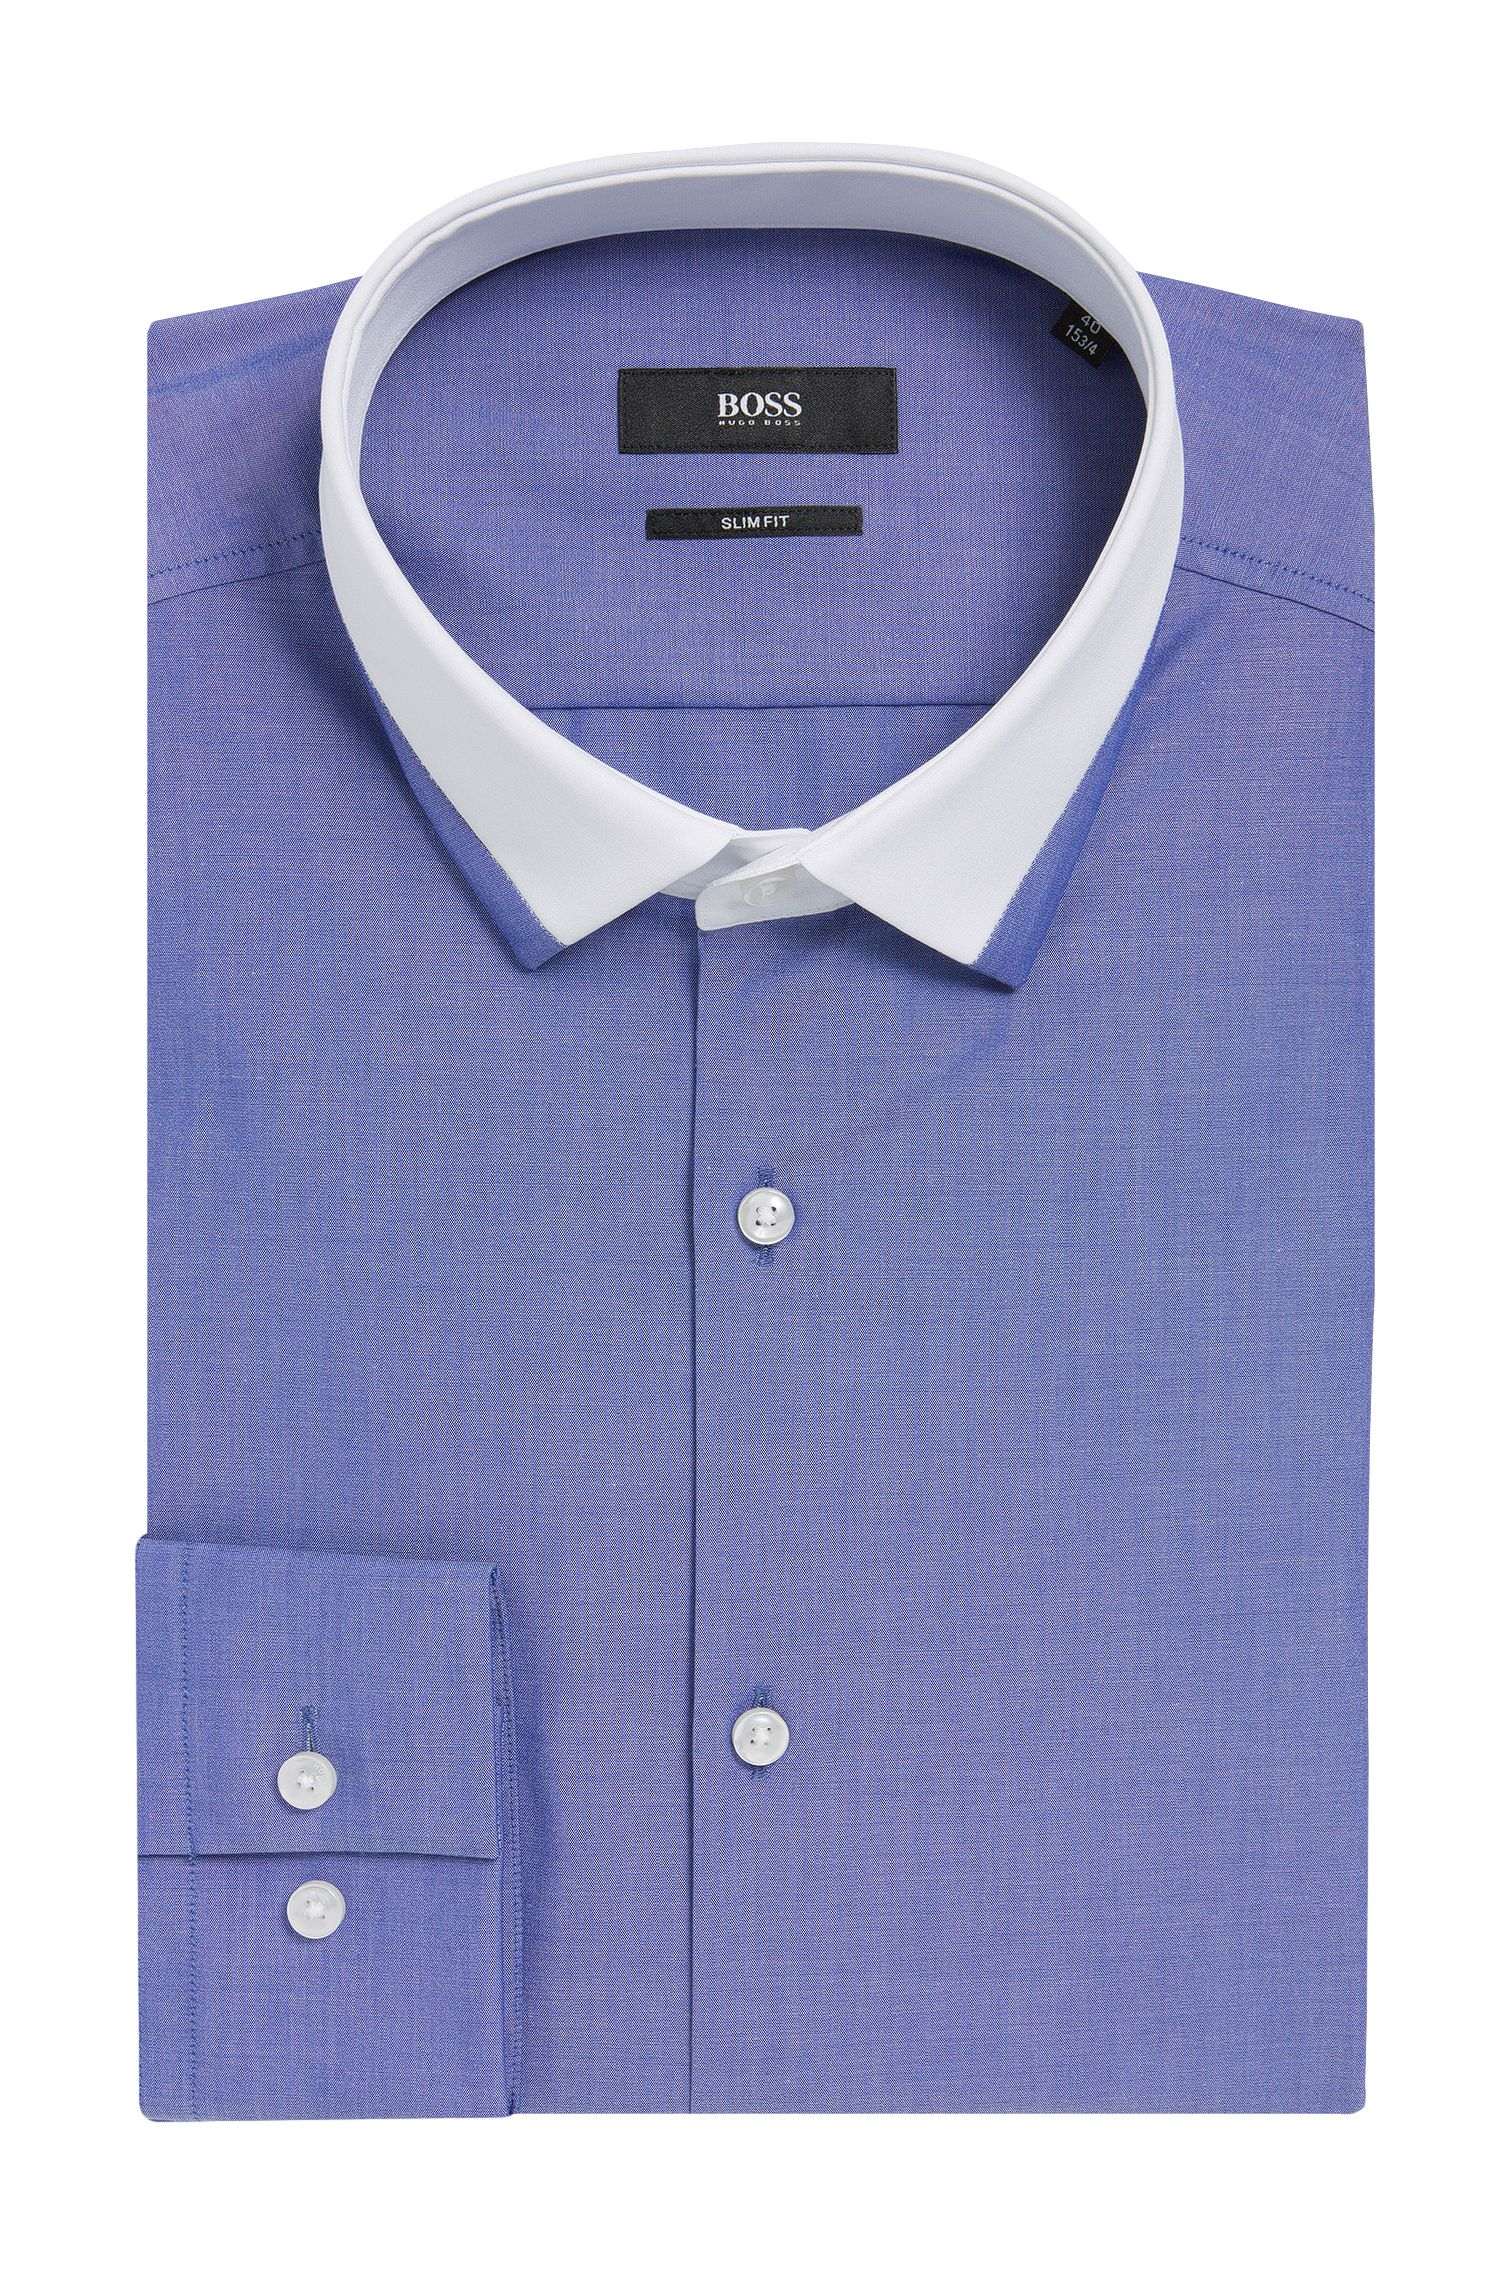 Contrast Collar Dress Shirt, Slim Fit| Jerrell